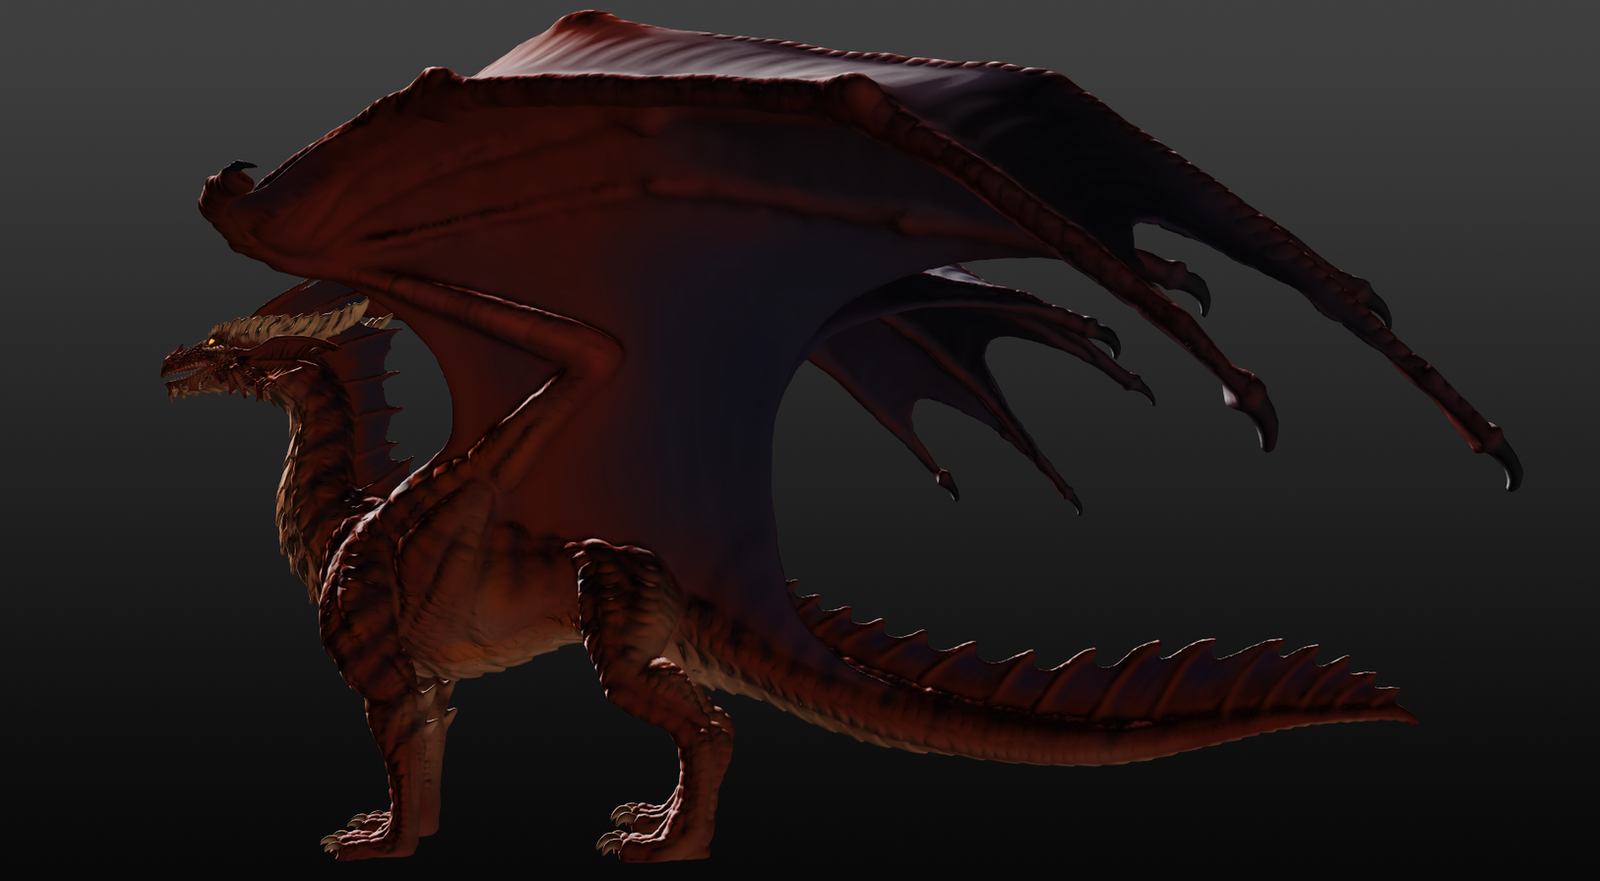 Red Dragon Sculpture Angle 2 by JereduLevenin on DeviantArt